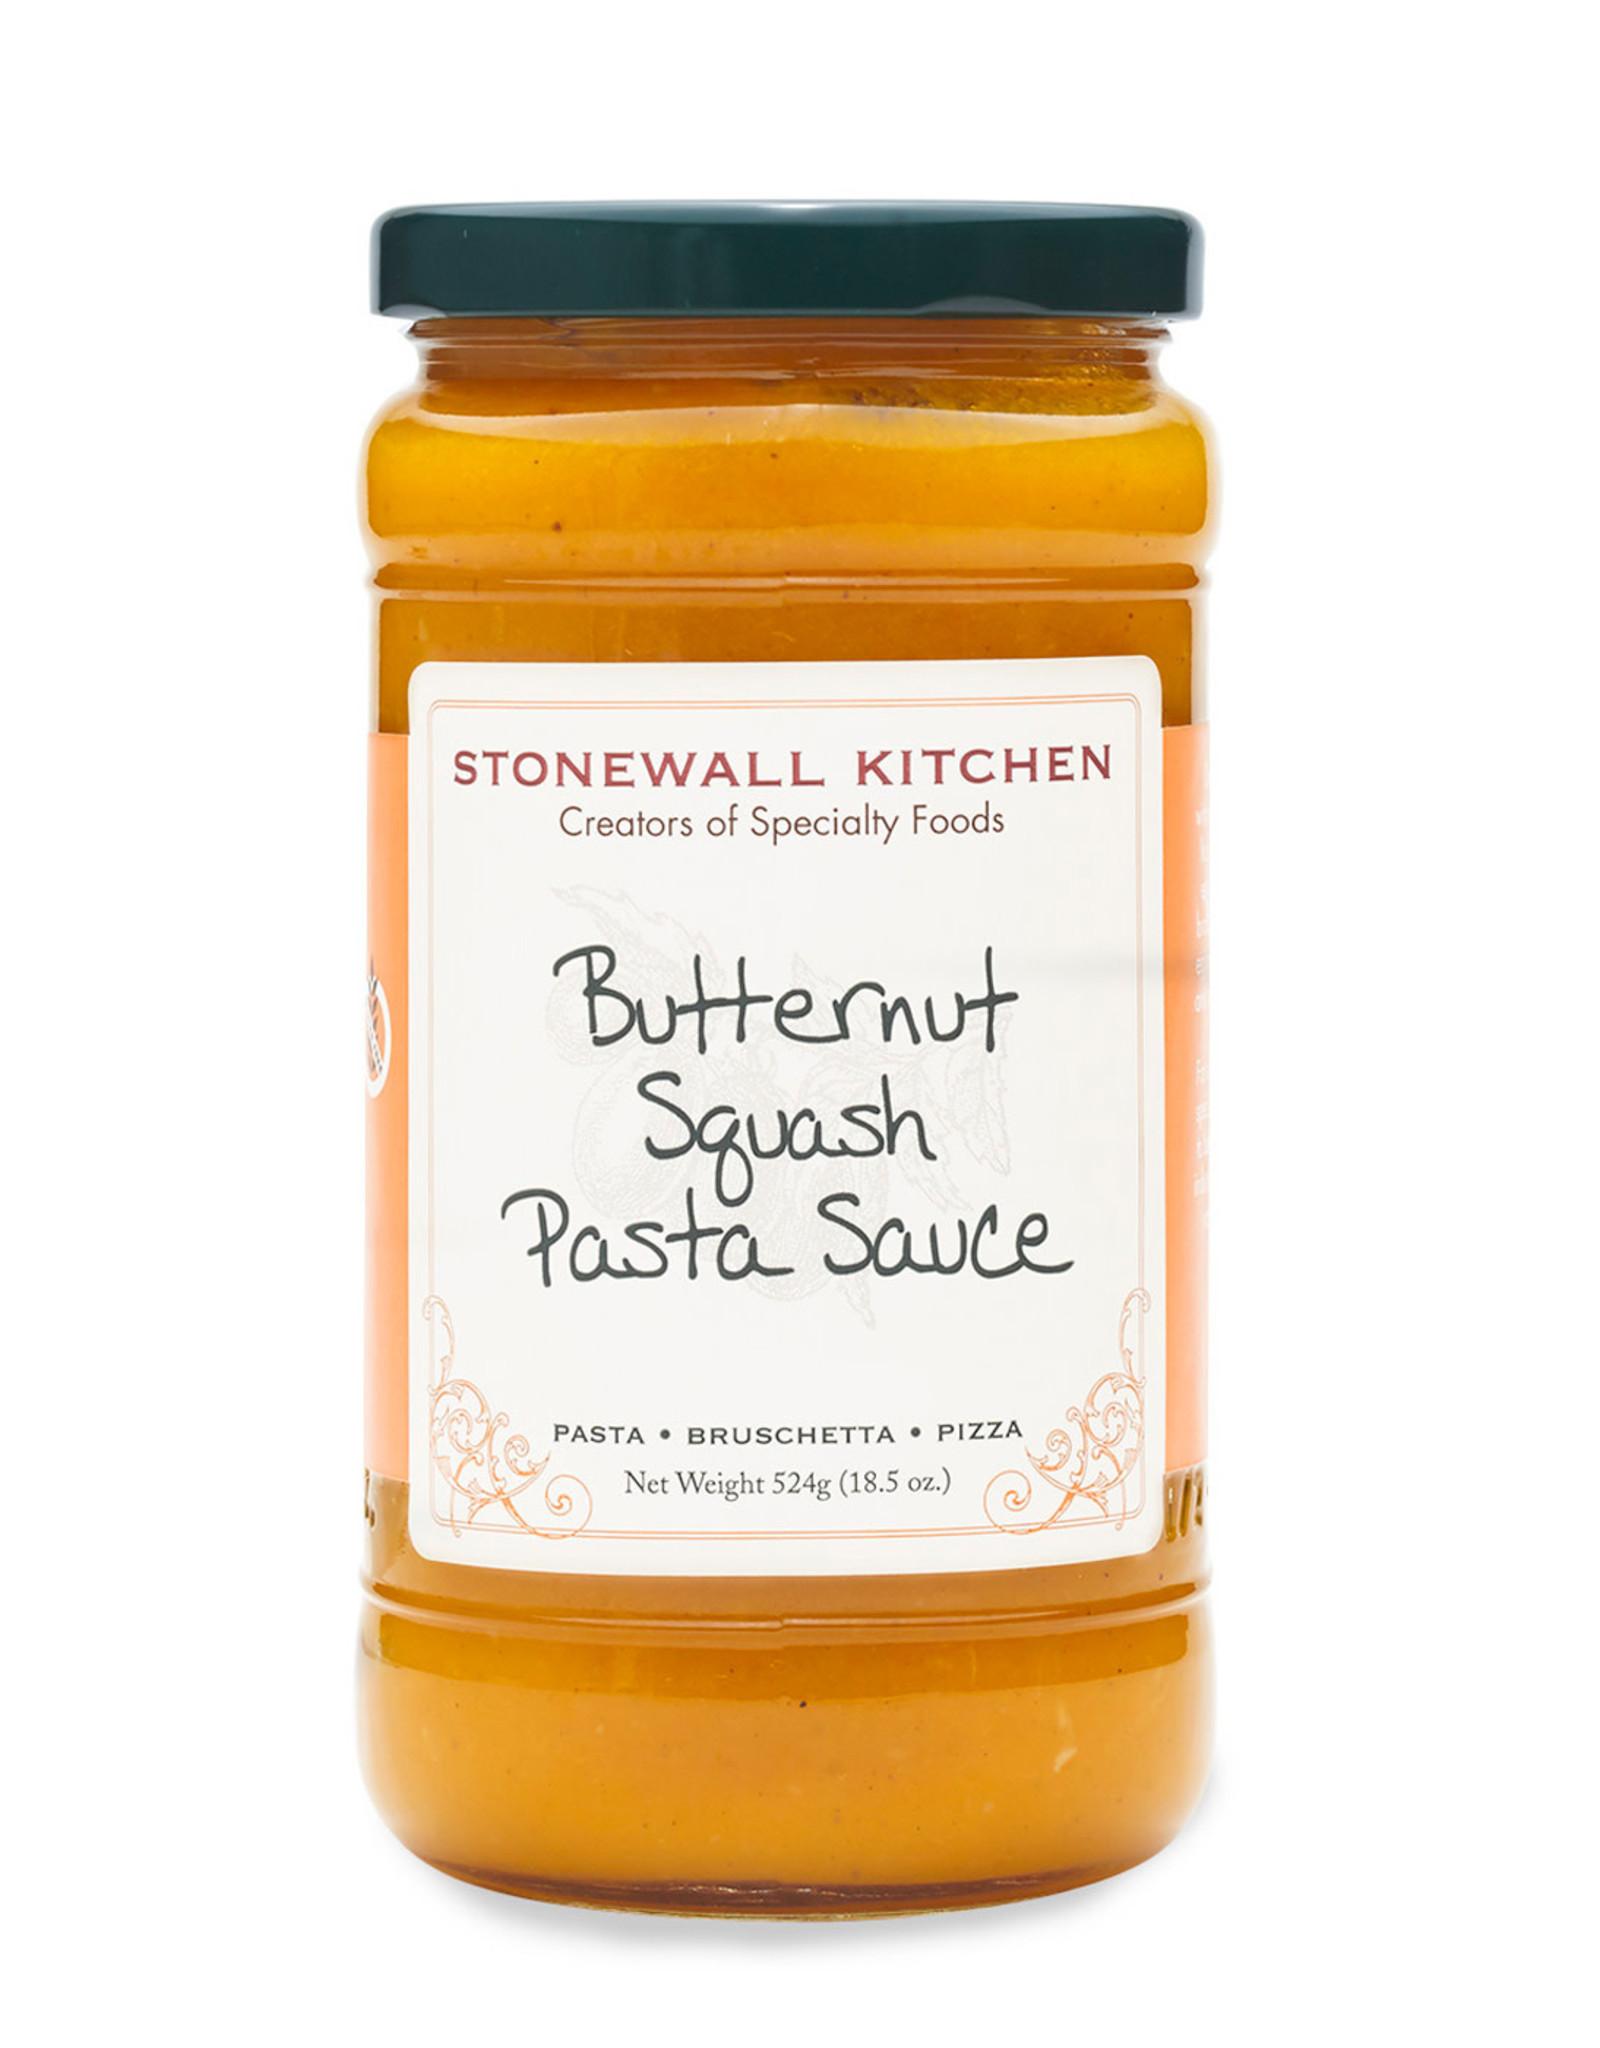 Stonewall Kitchen Butternut Squash Pasta Sauce